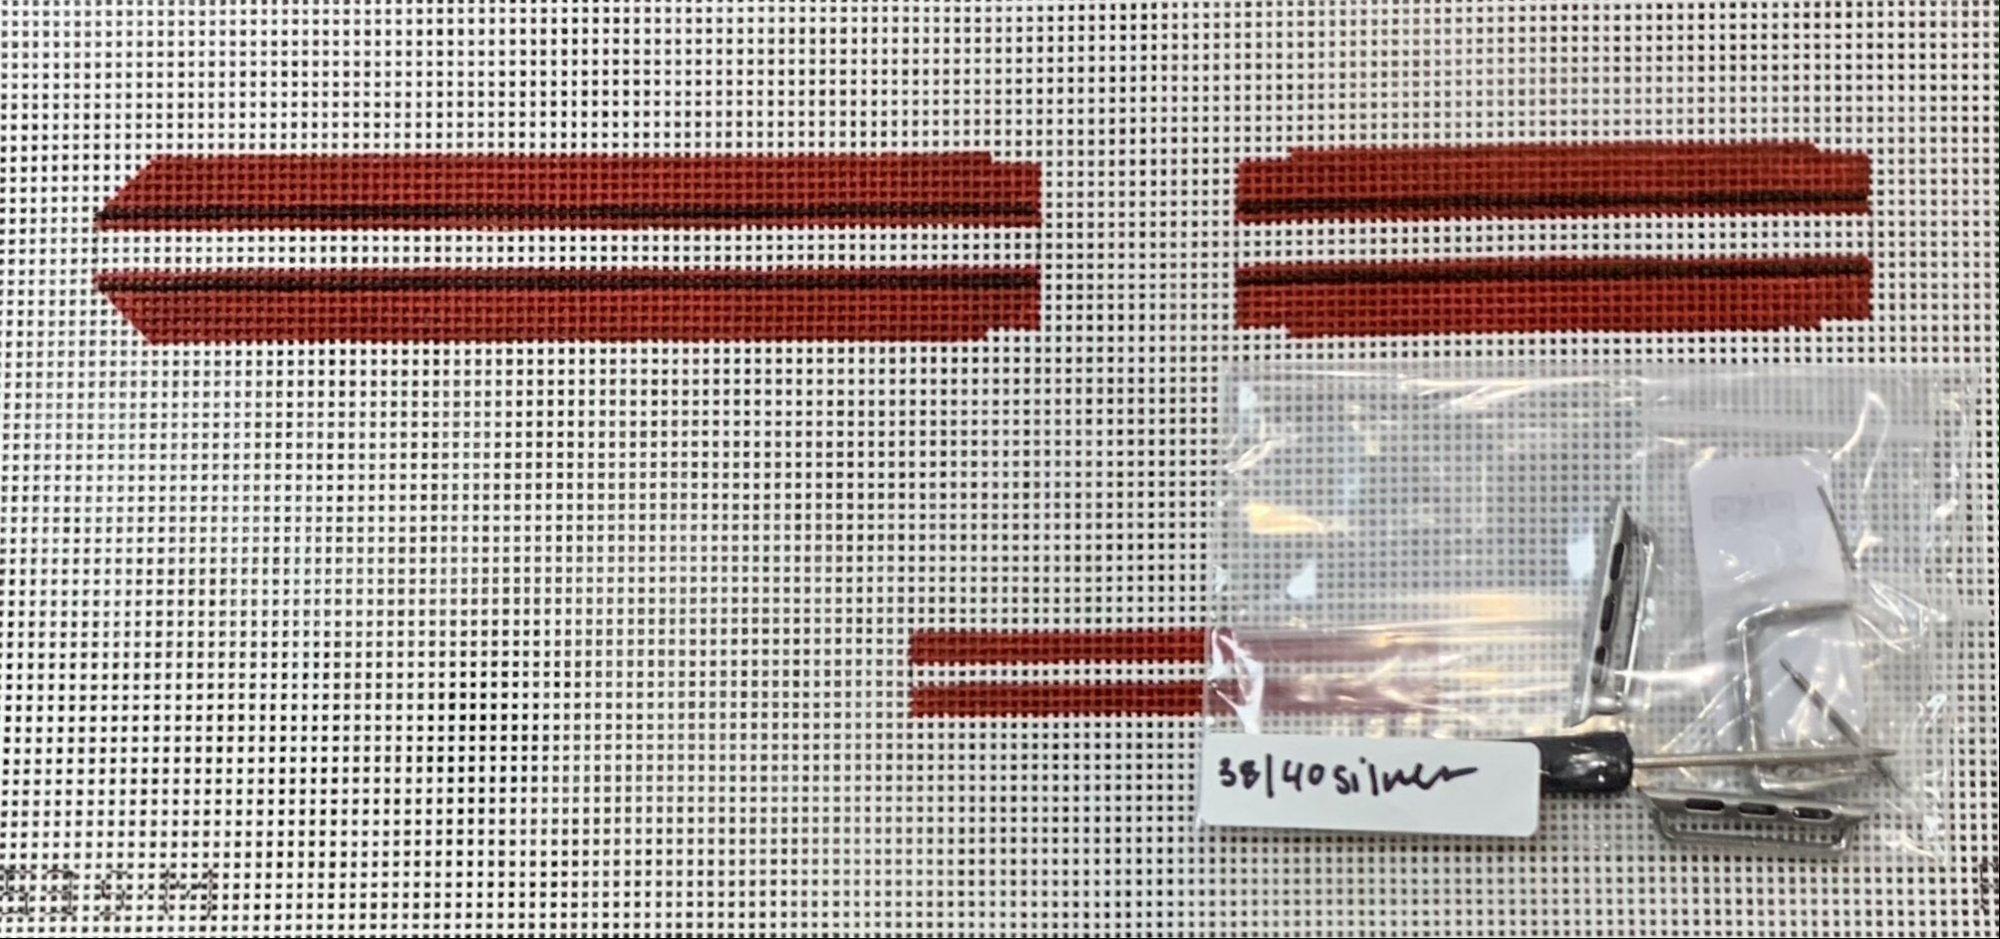 Apple Watch Band (Kit) - Red/Black/White Stripe